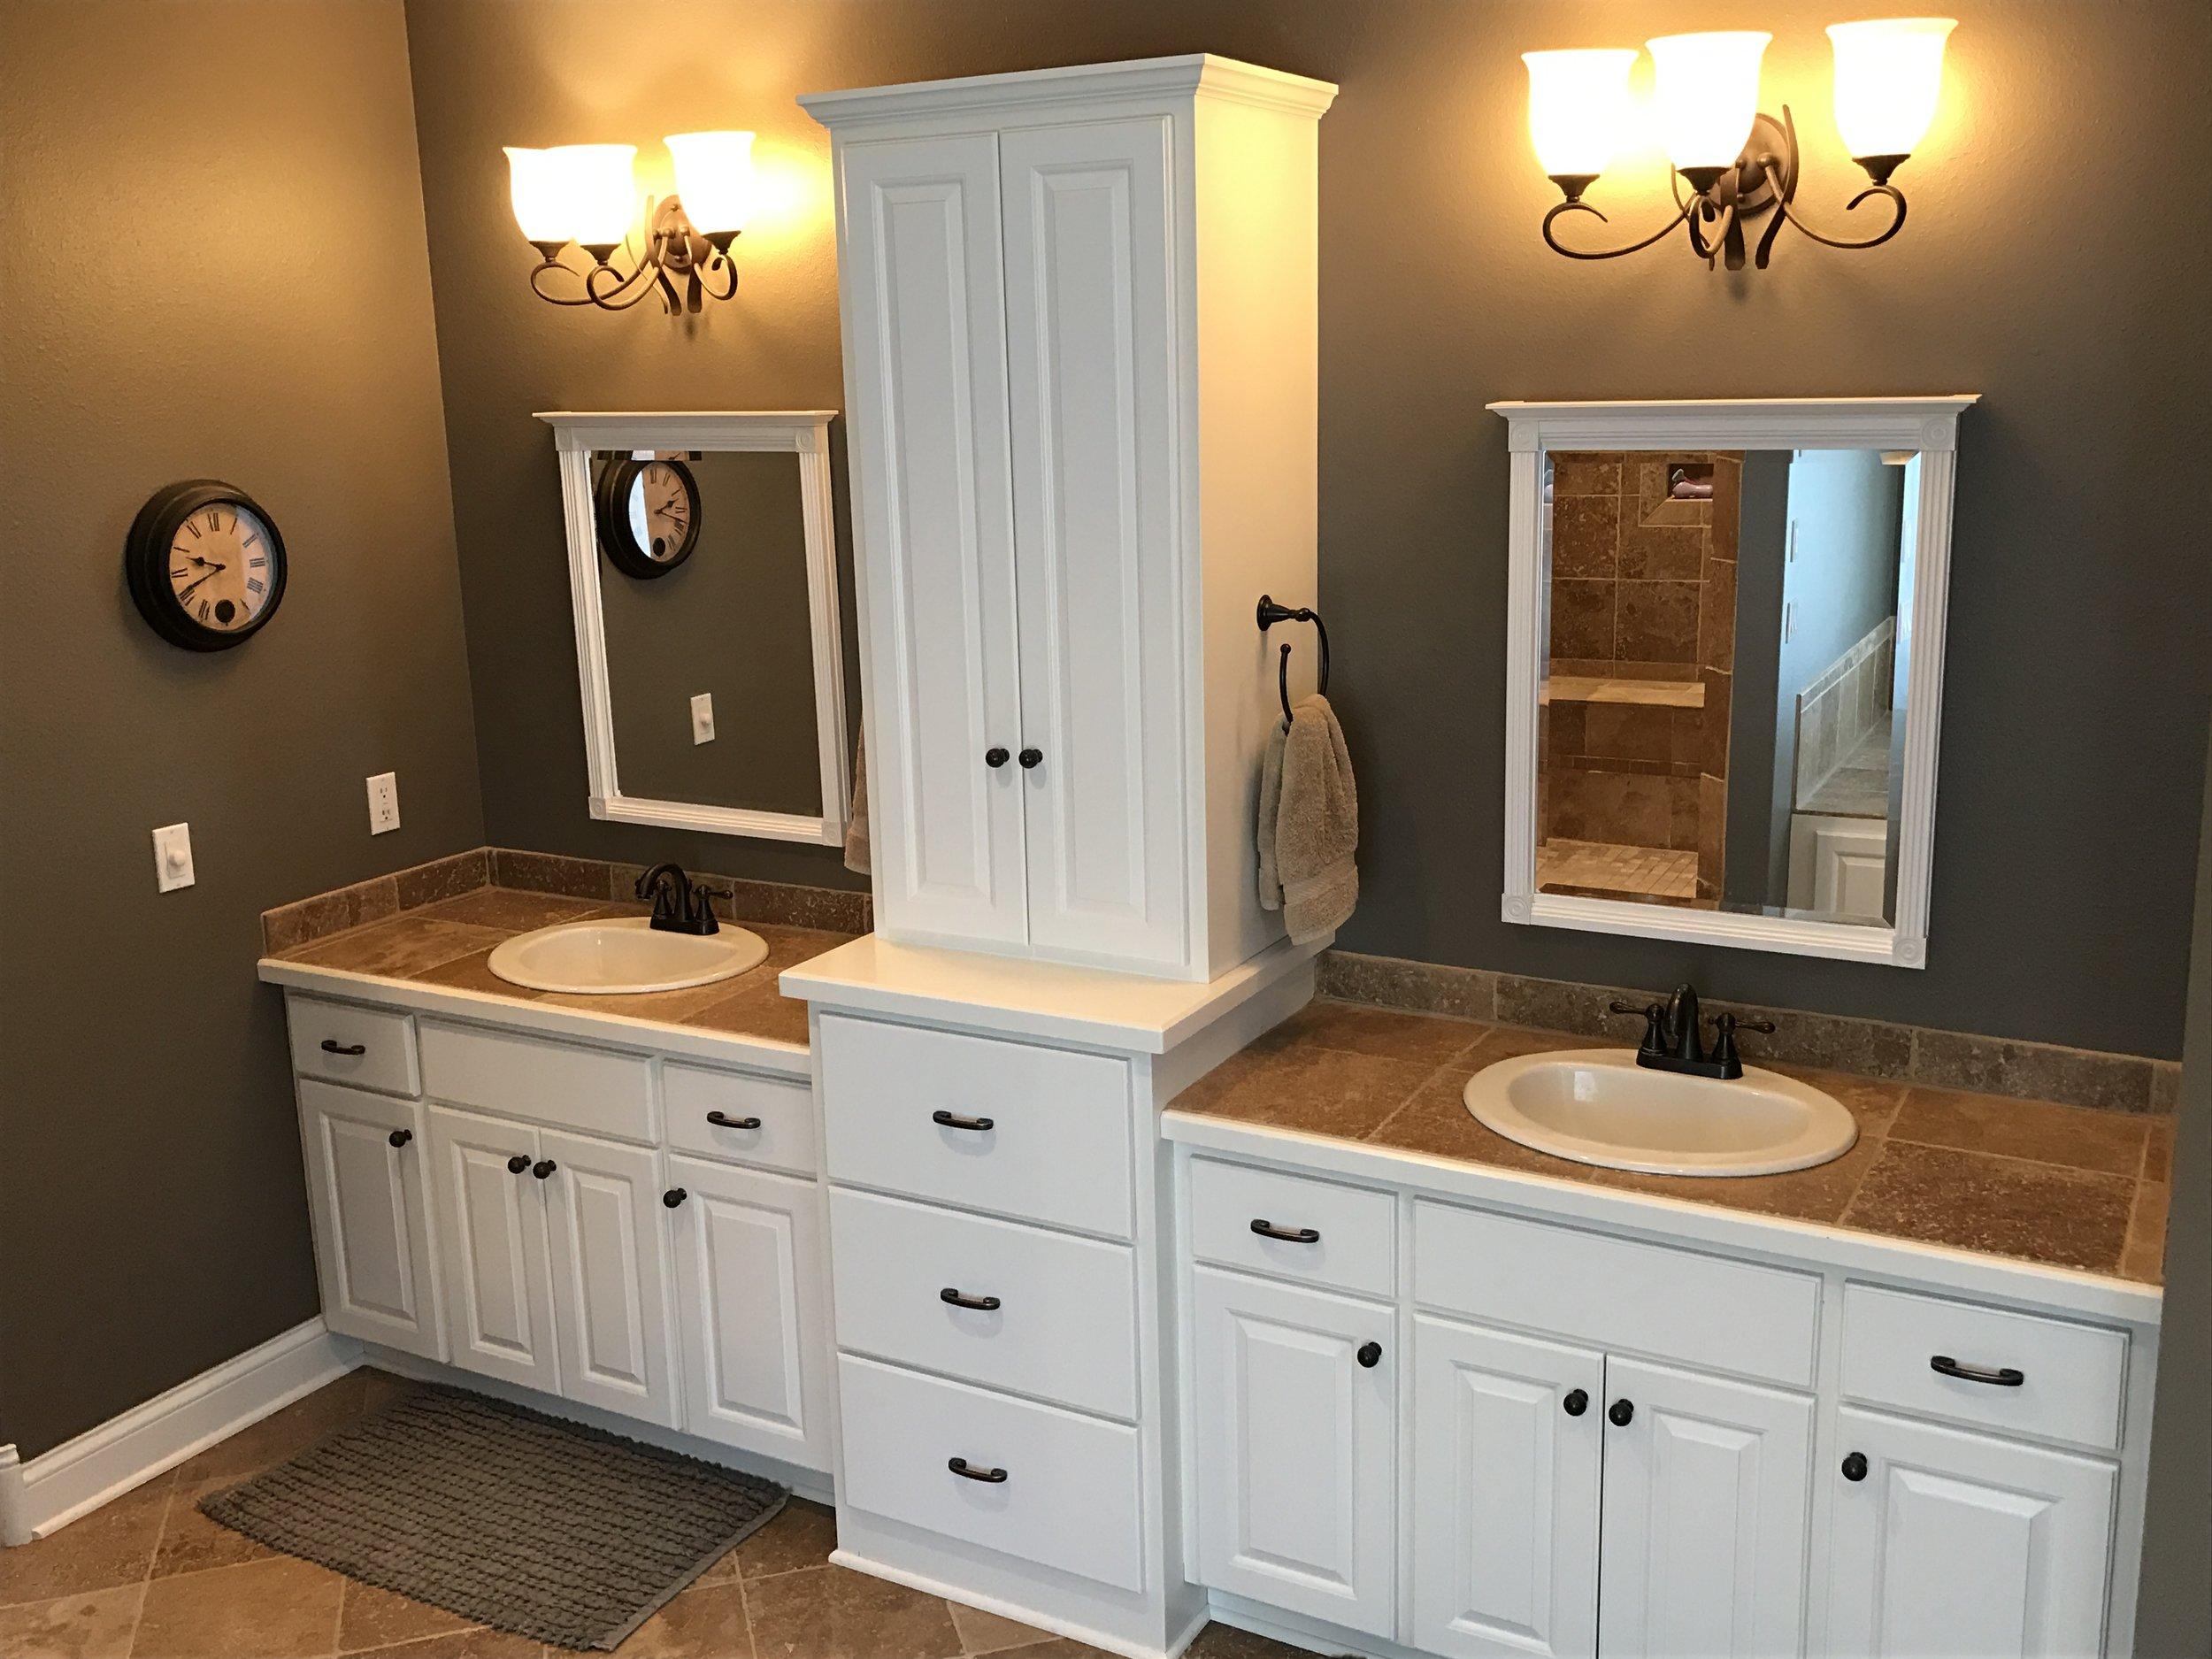 Executive Rambler — vo Homes on log home bathroom designs, french country bathroom designs, split level bathroom designs, farm house bathroom designs, transitional bathroom designs,